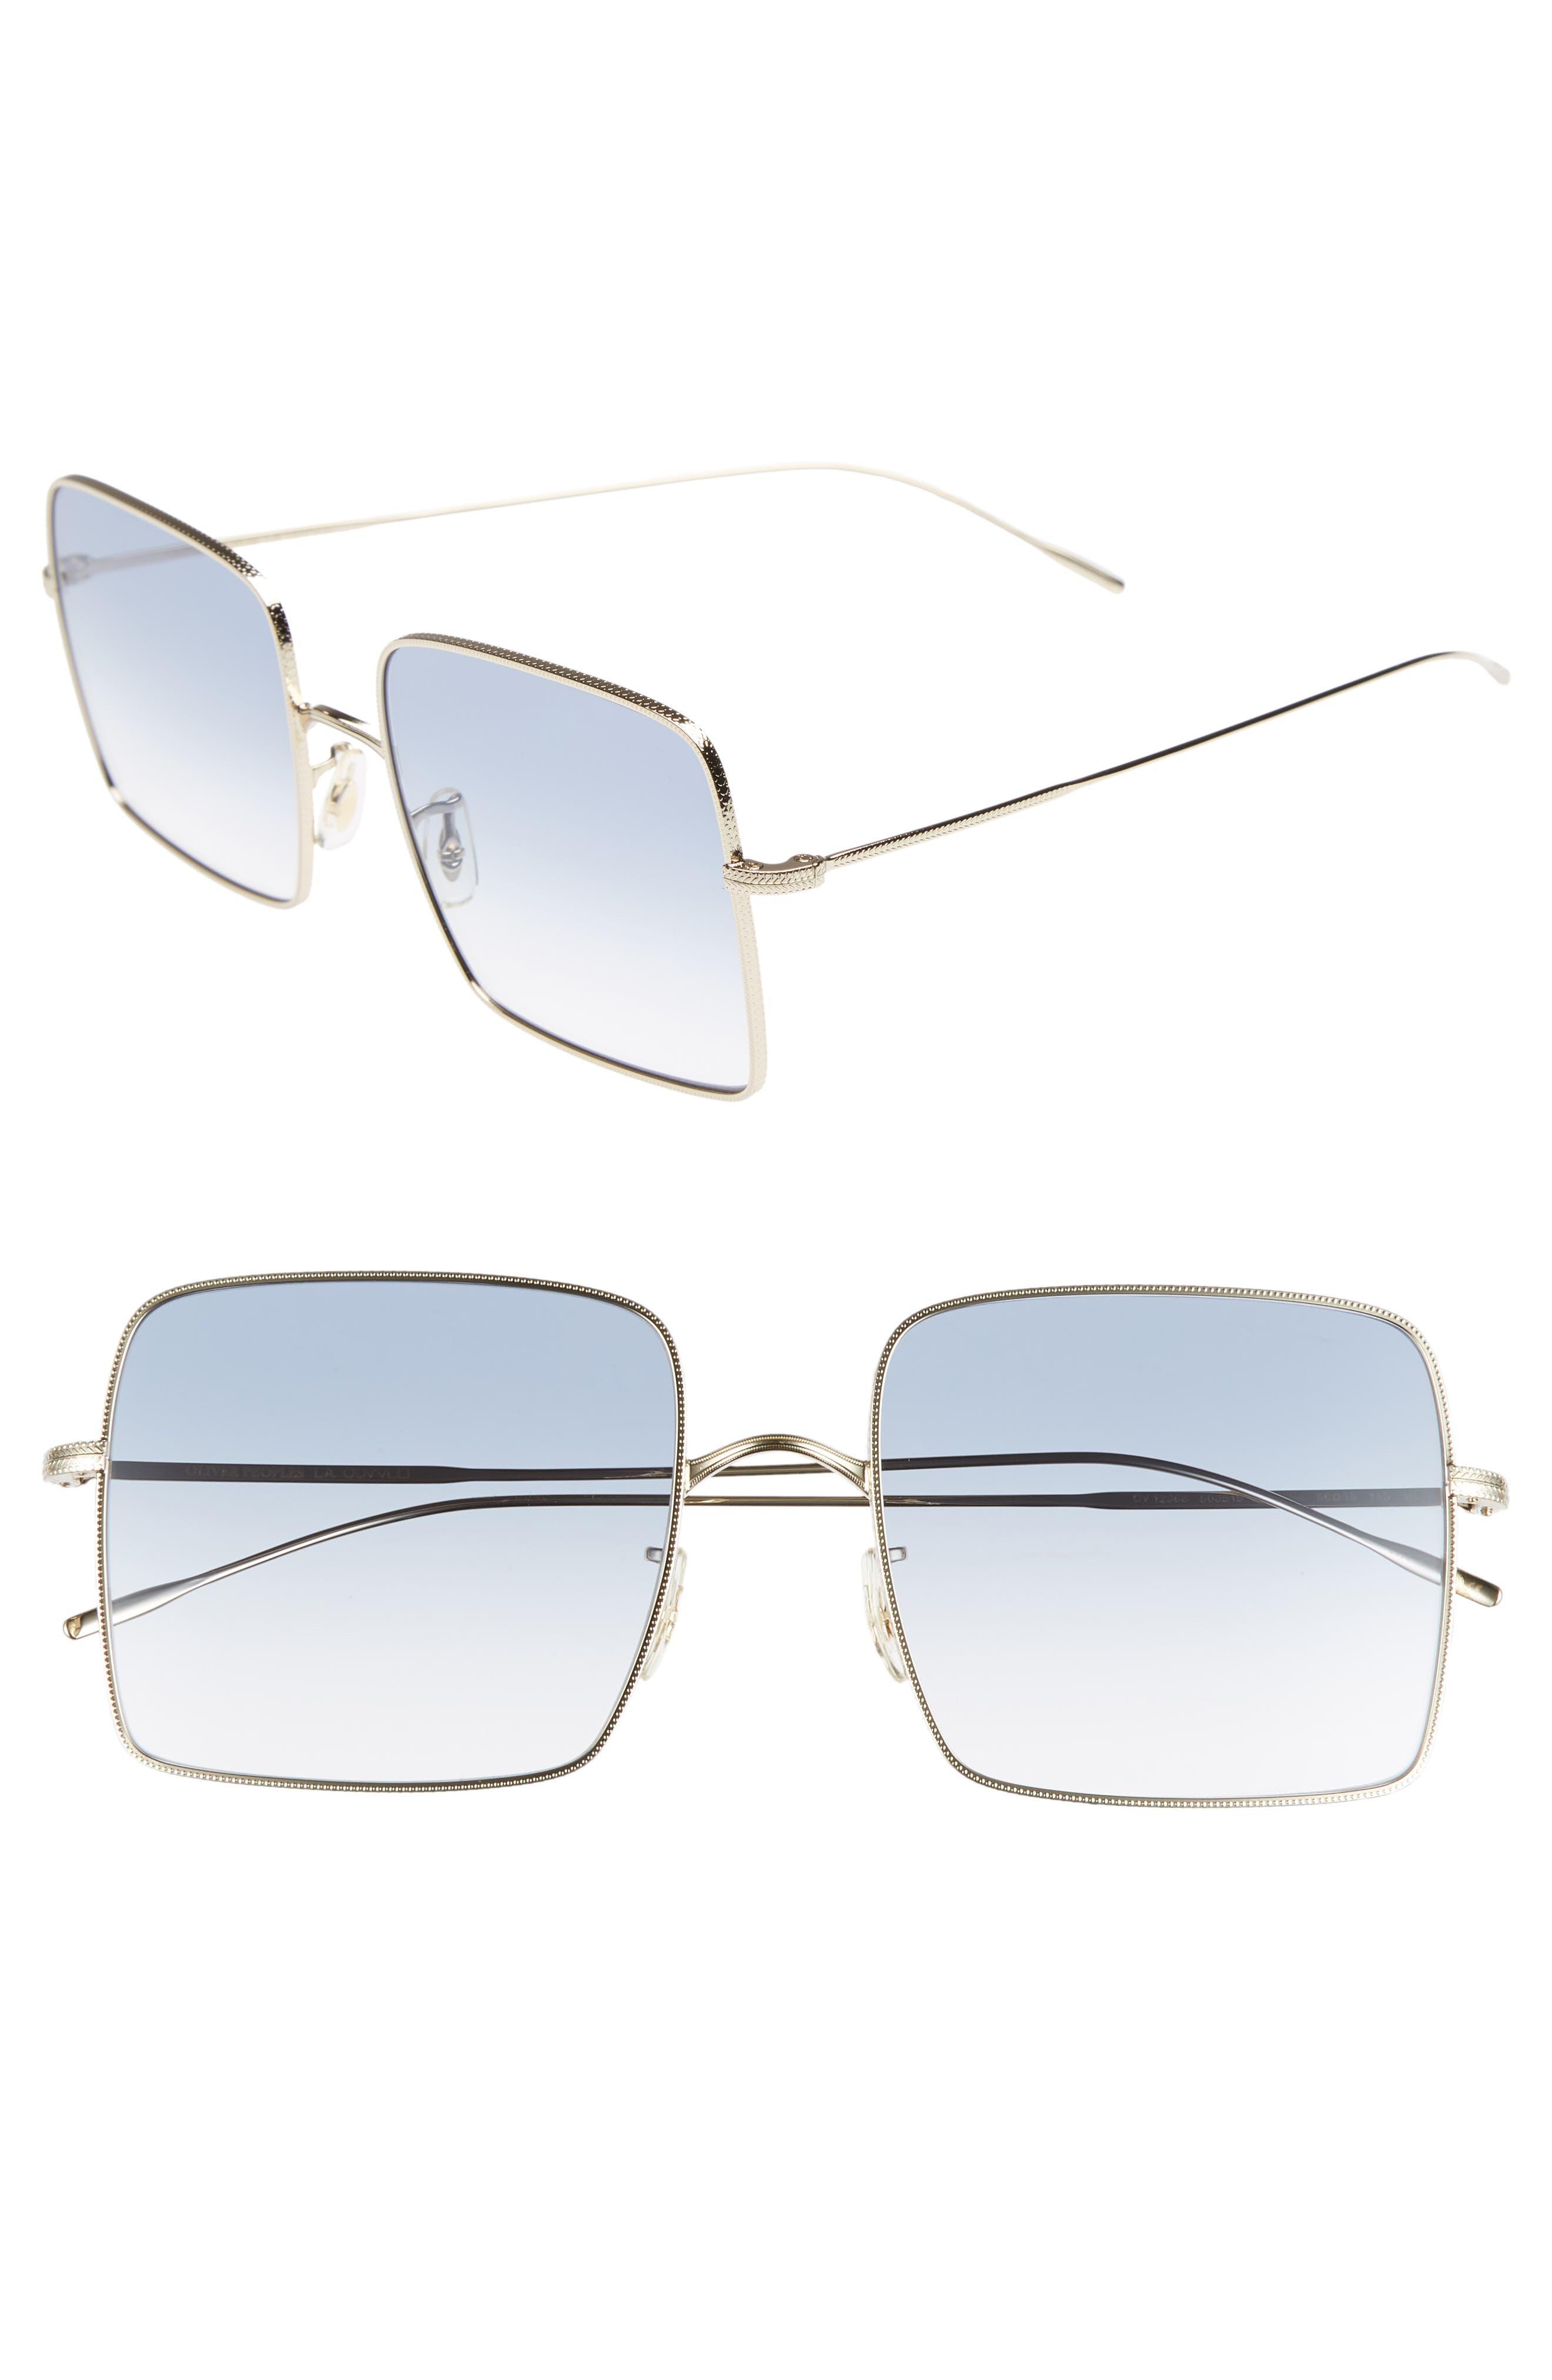 Rassine 56mm Sunglasses,                         Main,                         color, Soft Gold Blue